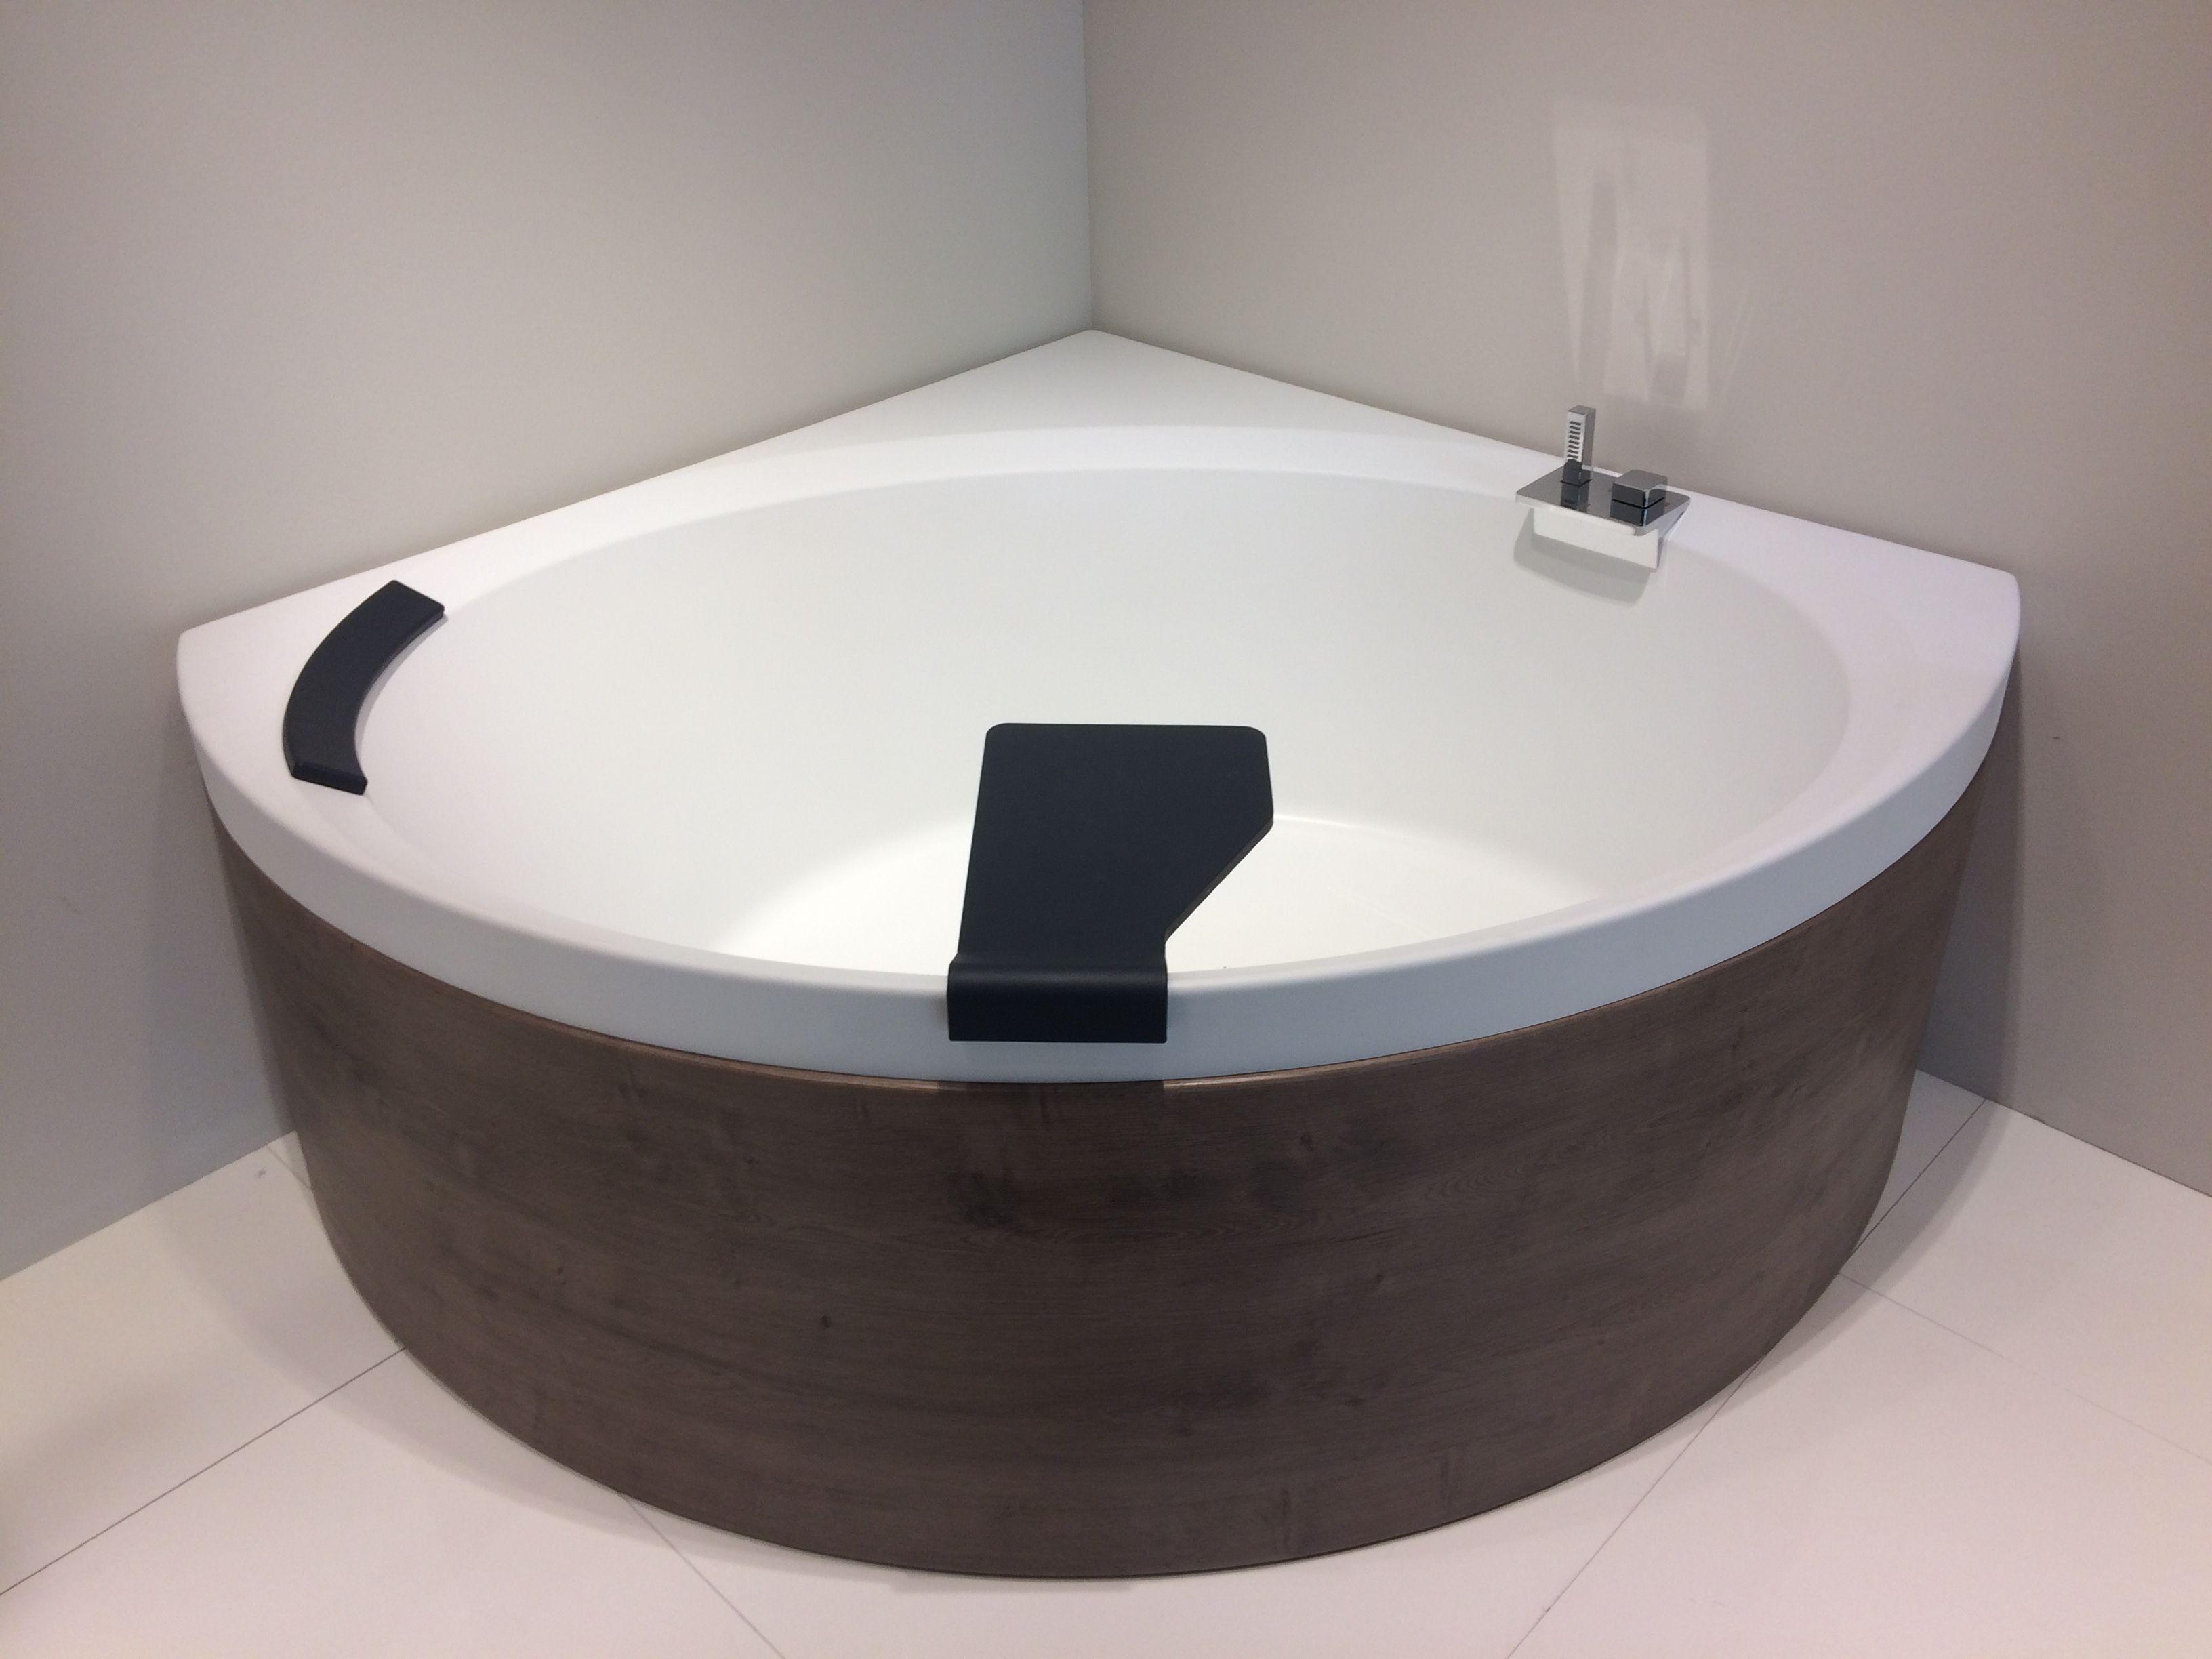 novellini divina hoekbad mat wit acryl voorpaneel in kleur